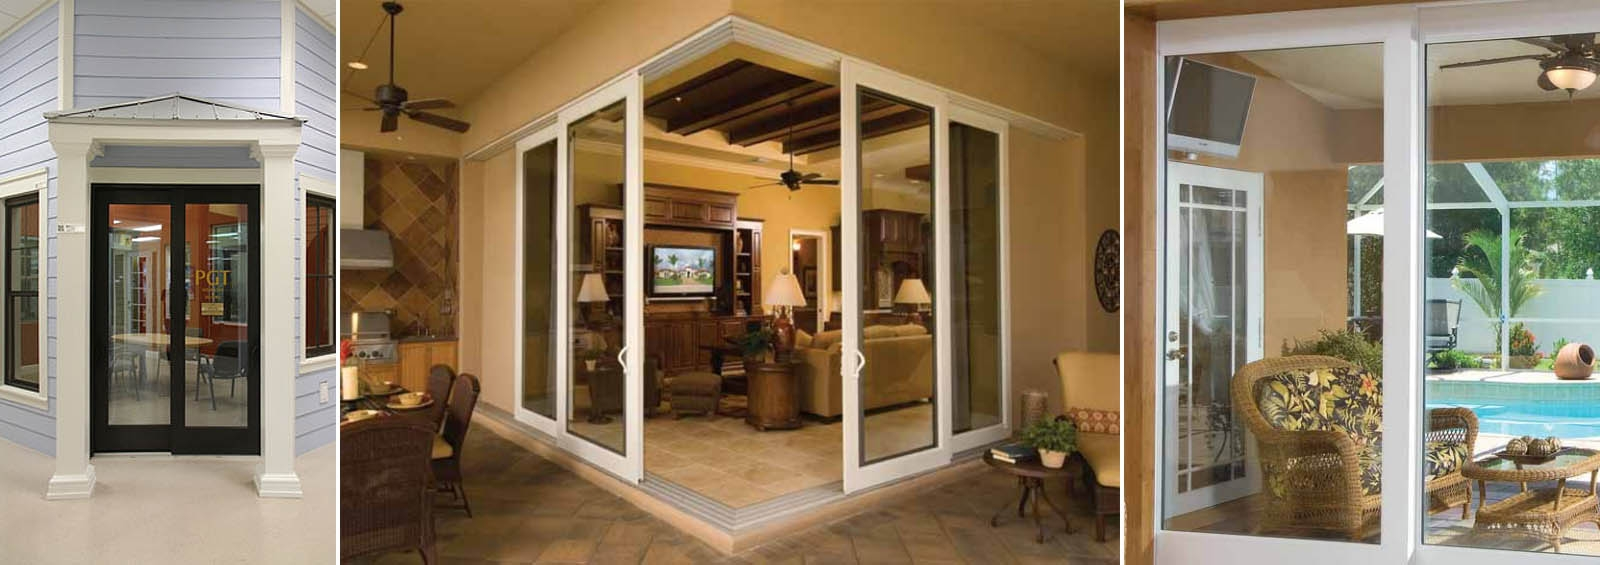 Movie sliding glass doors